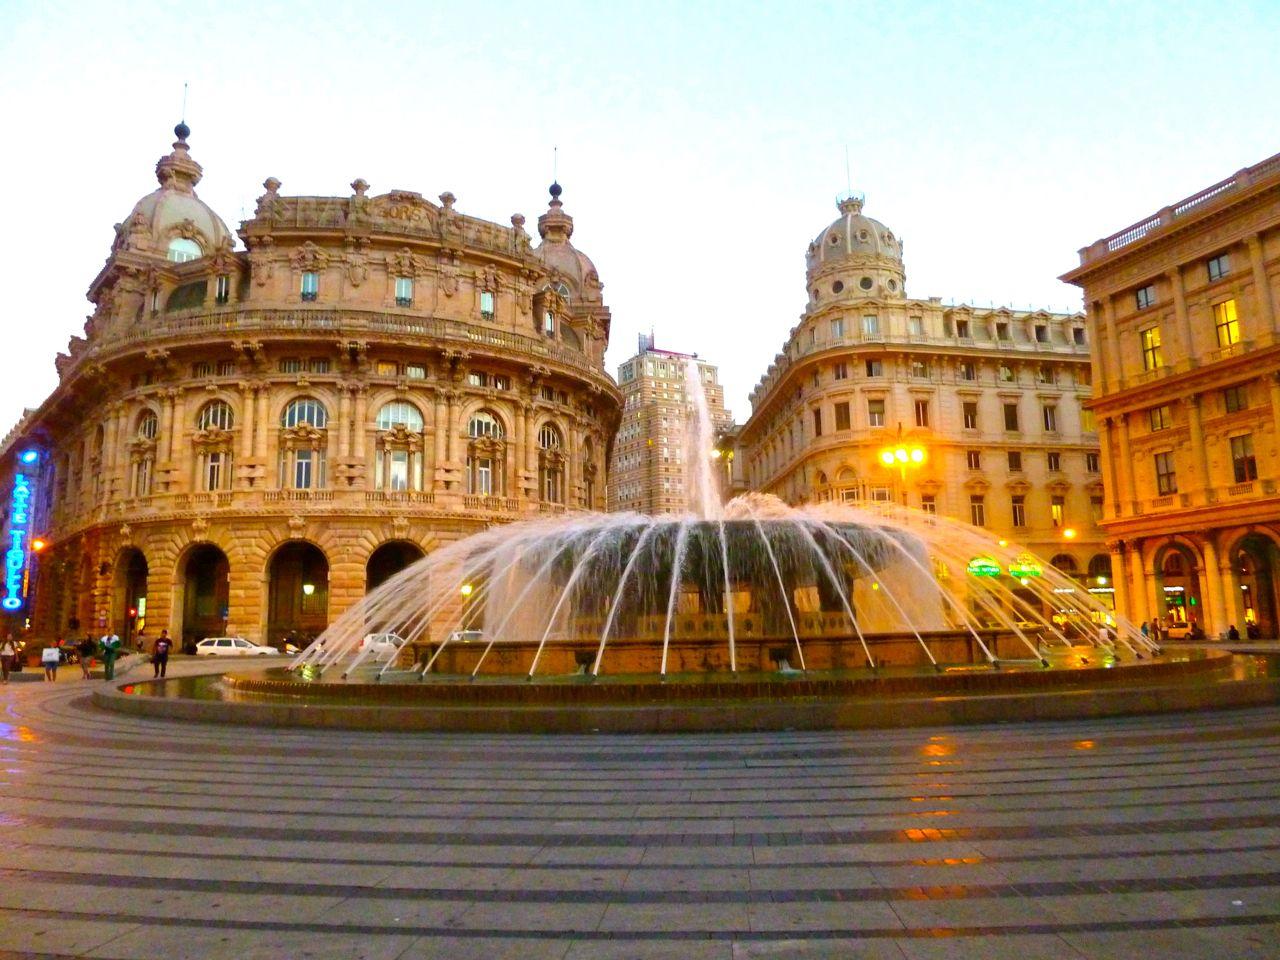 The best of Genoa, Italy http://www.goseewrite.com/2014/03/best-genoa-italy/